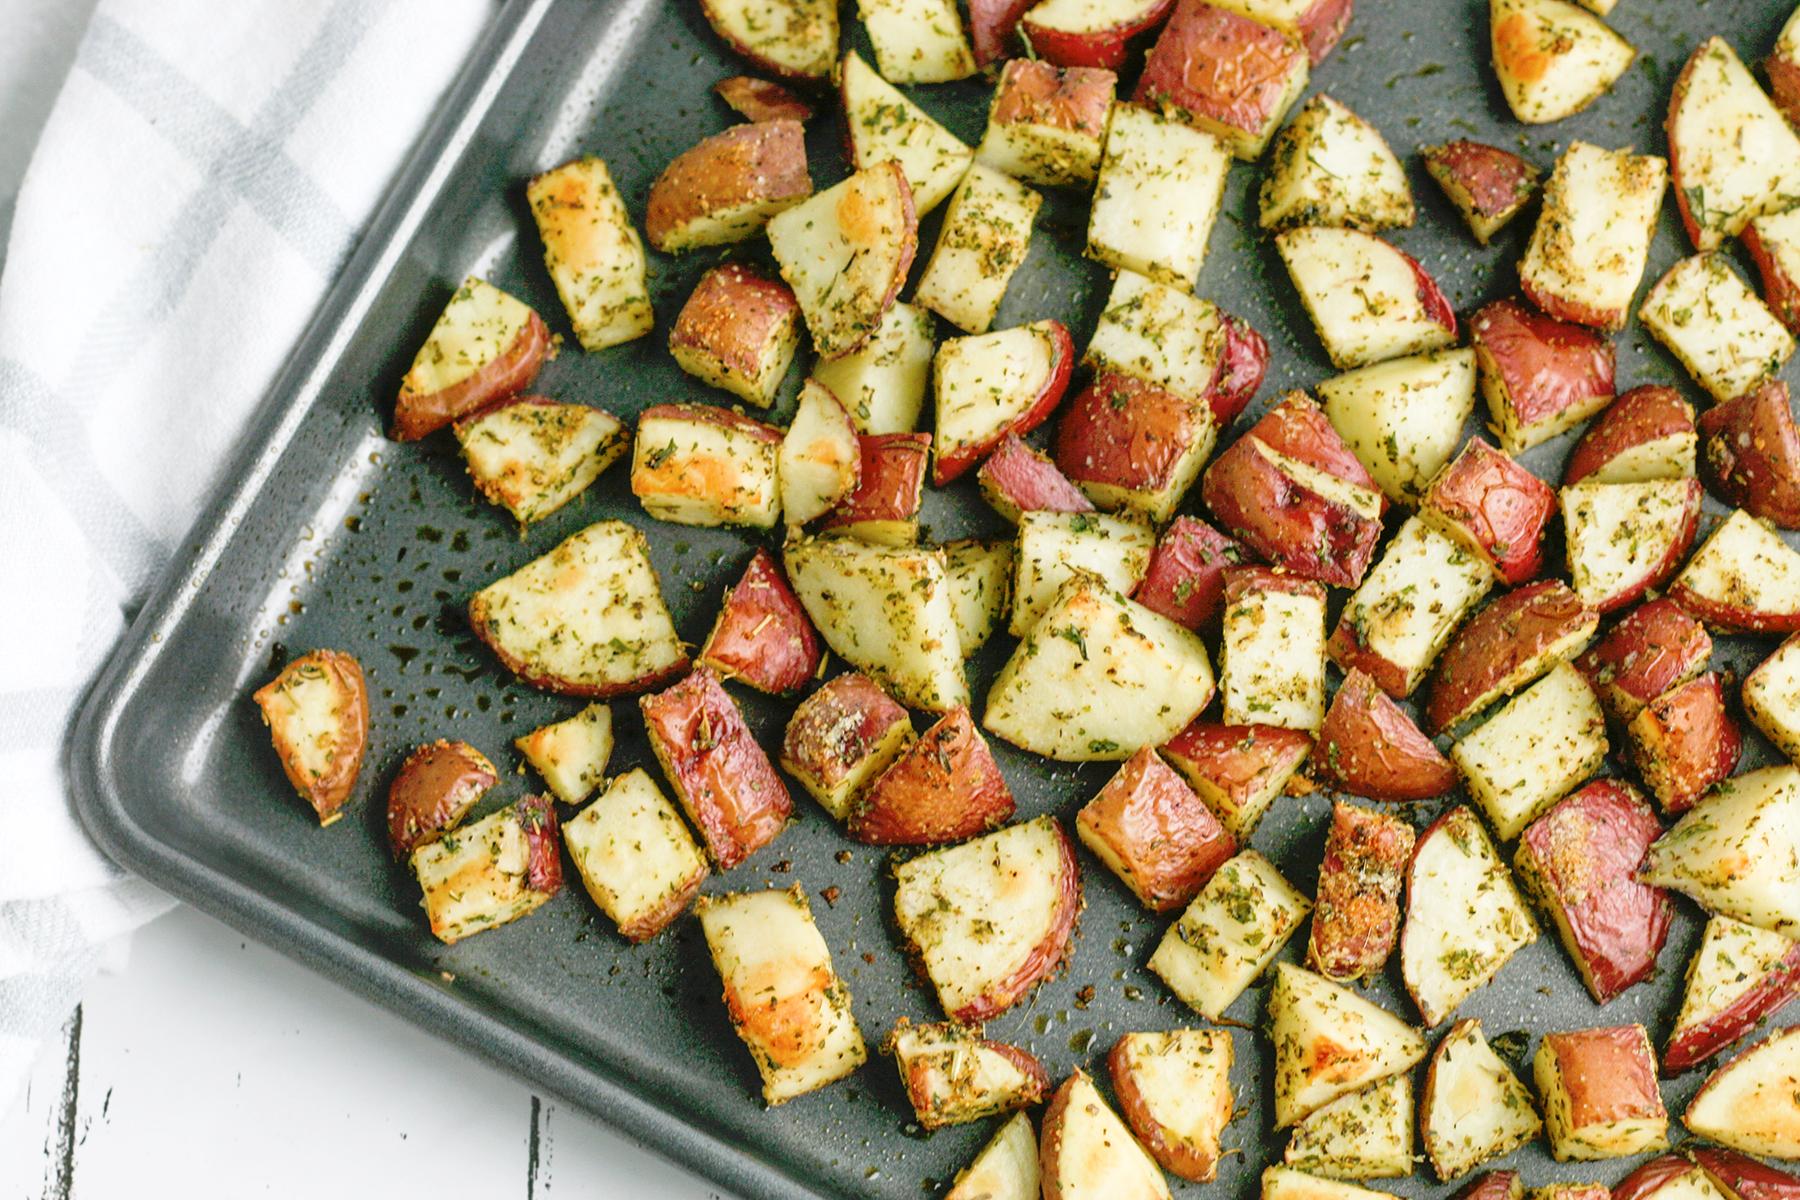 Italian Herb Roasted Potatoes